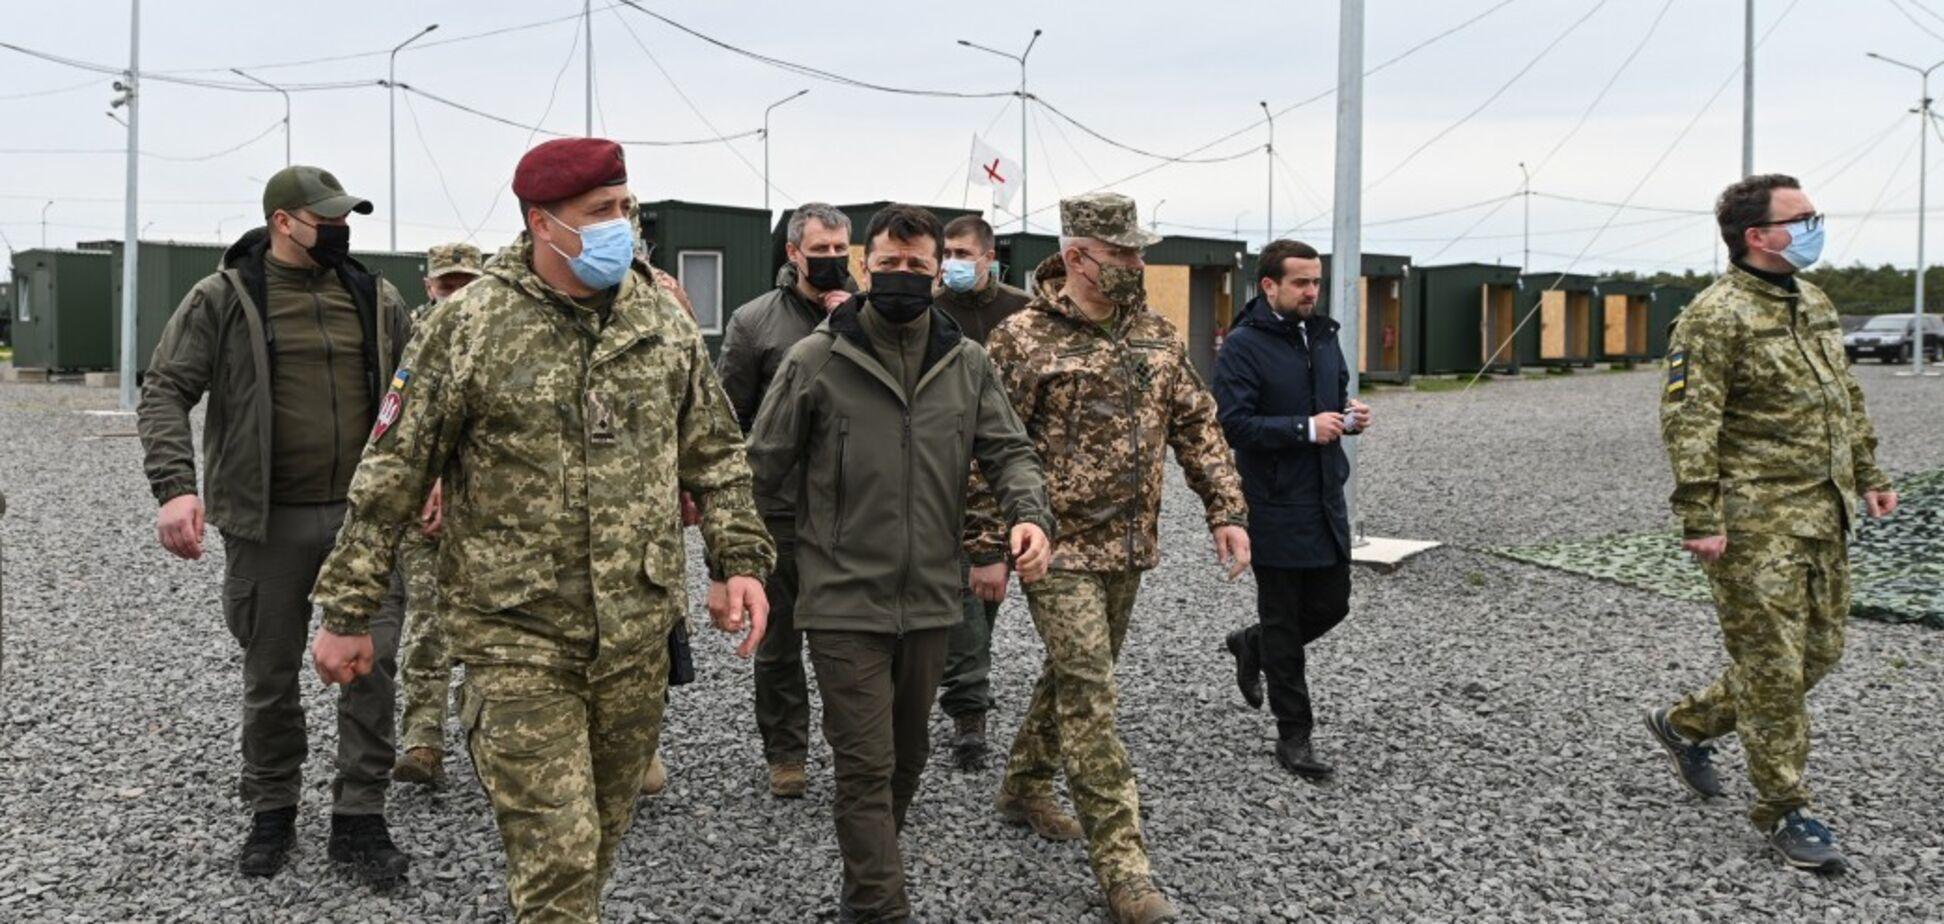 Зеленский надеется на объявление режима прекращения огня на встрече ТКГ